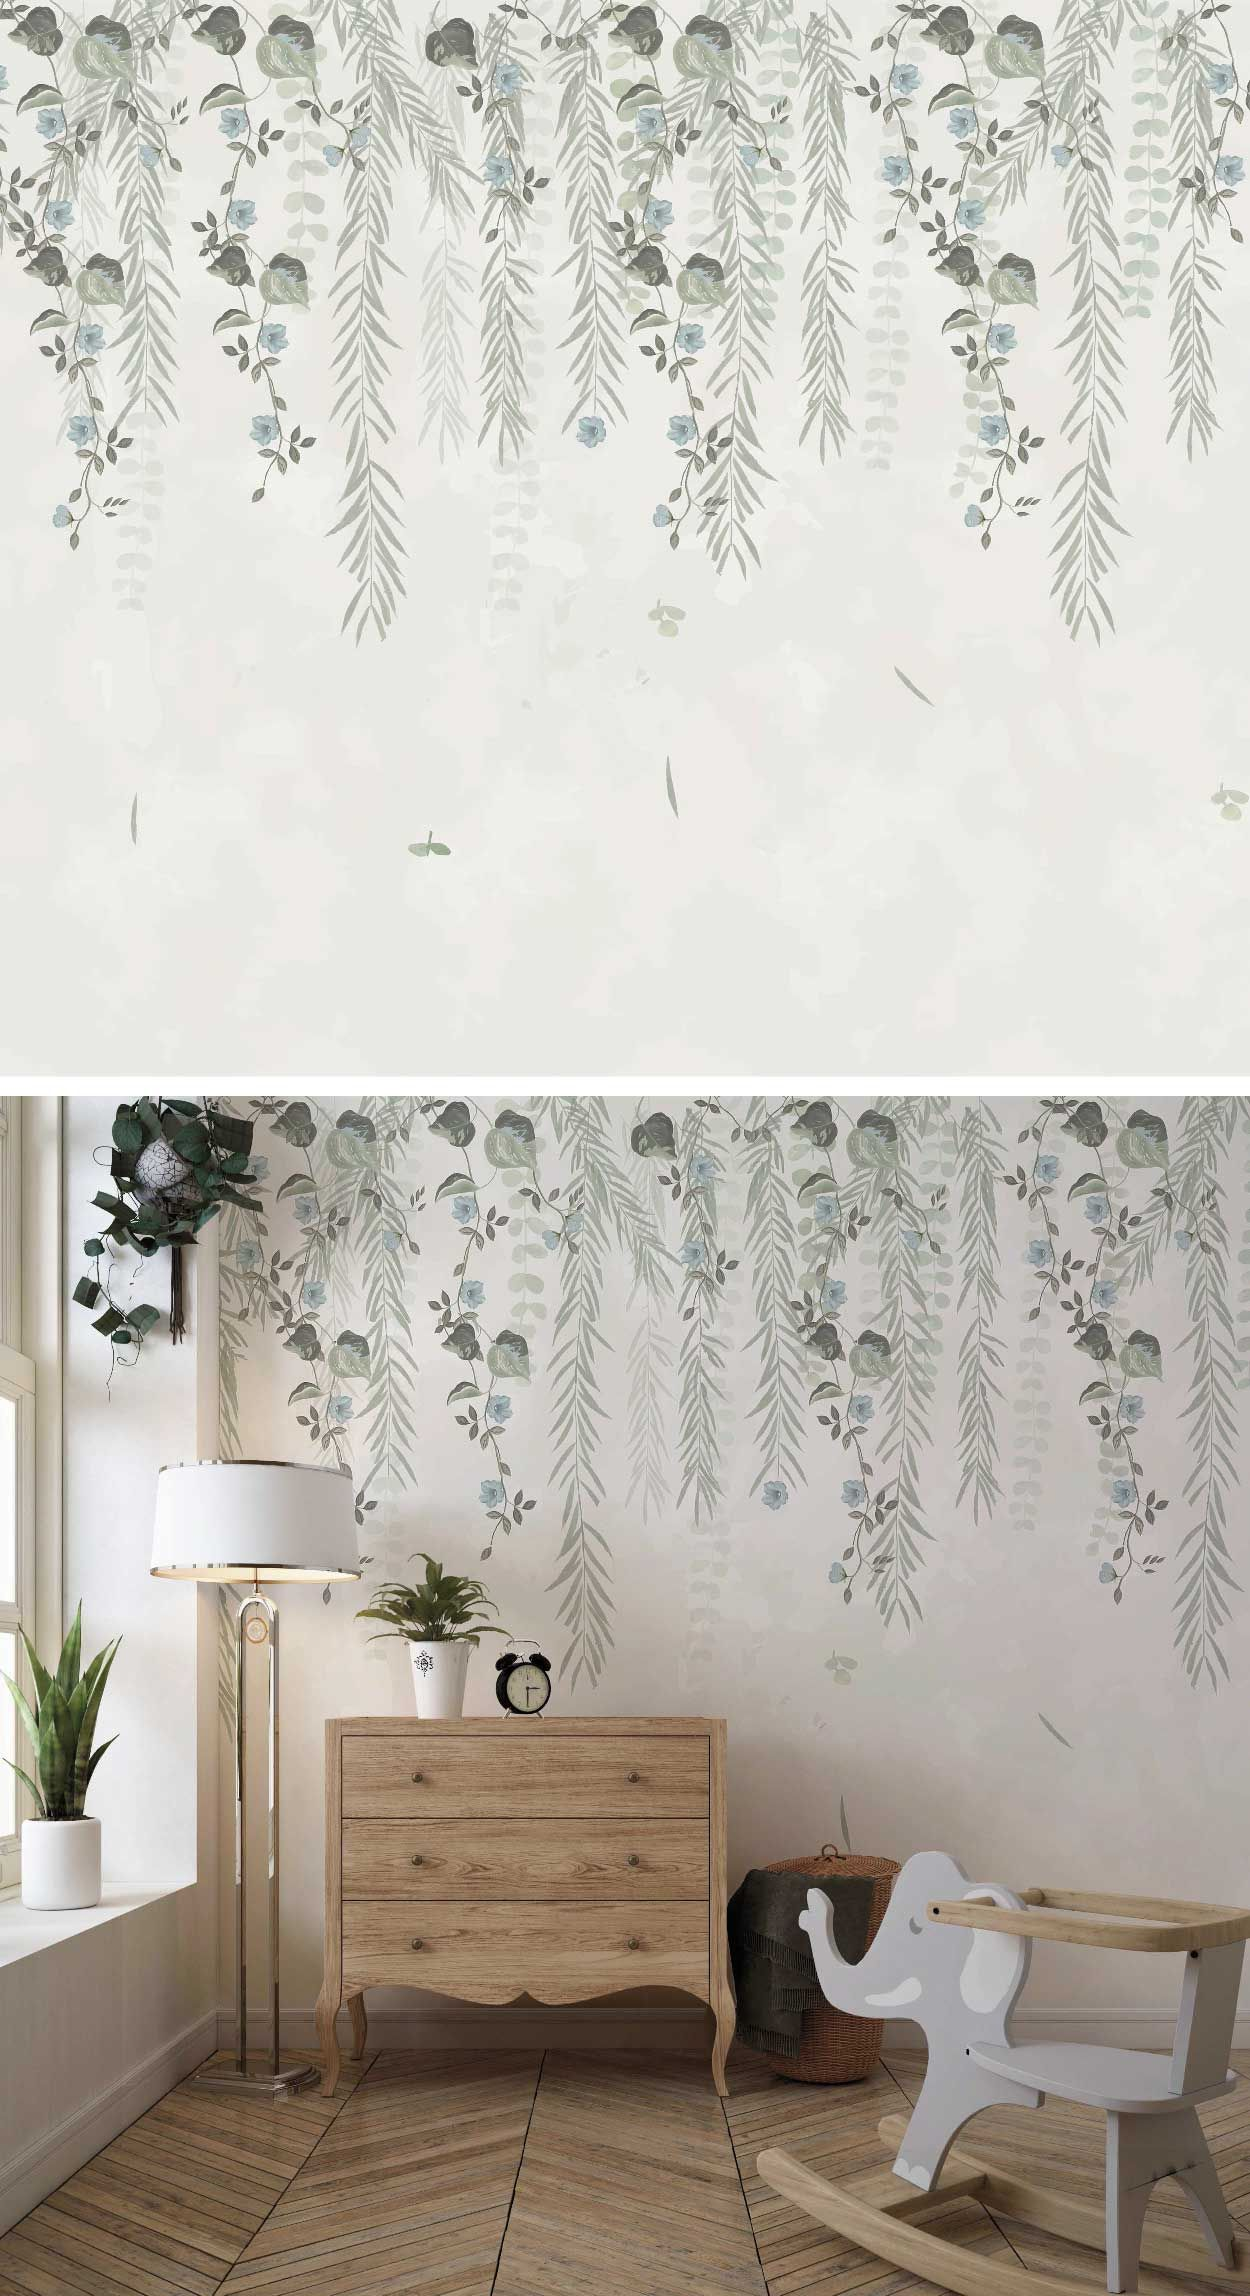 Leaves Mural Wallpaper Removable Leaves Wallpaper Hanging Etsy In 2021 Decor Leaf Wallpaper Removing Old Wallpaper